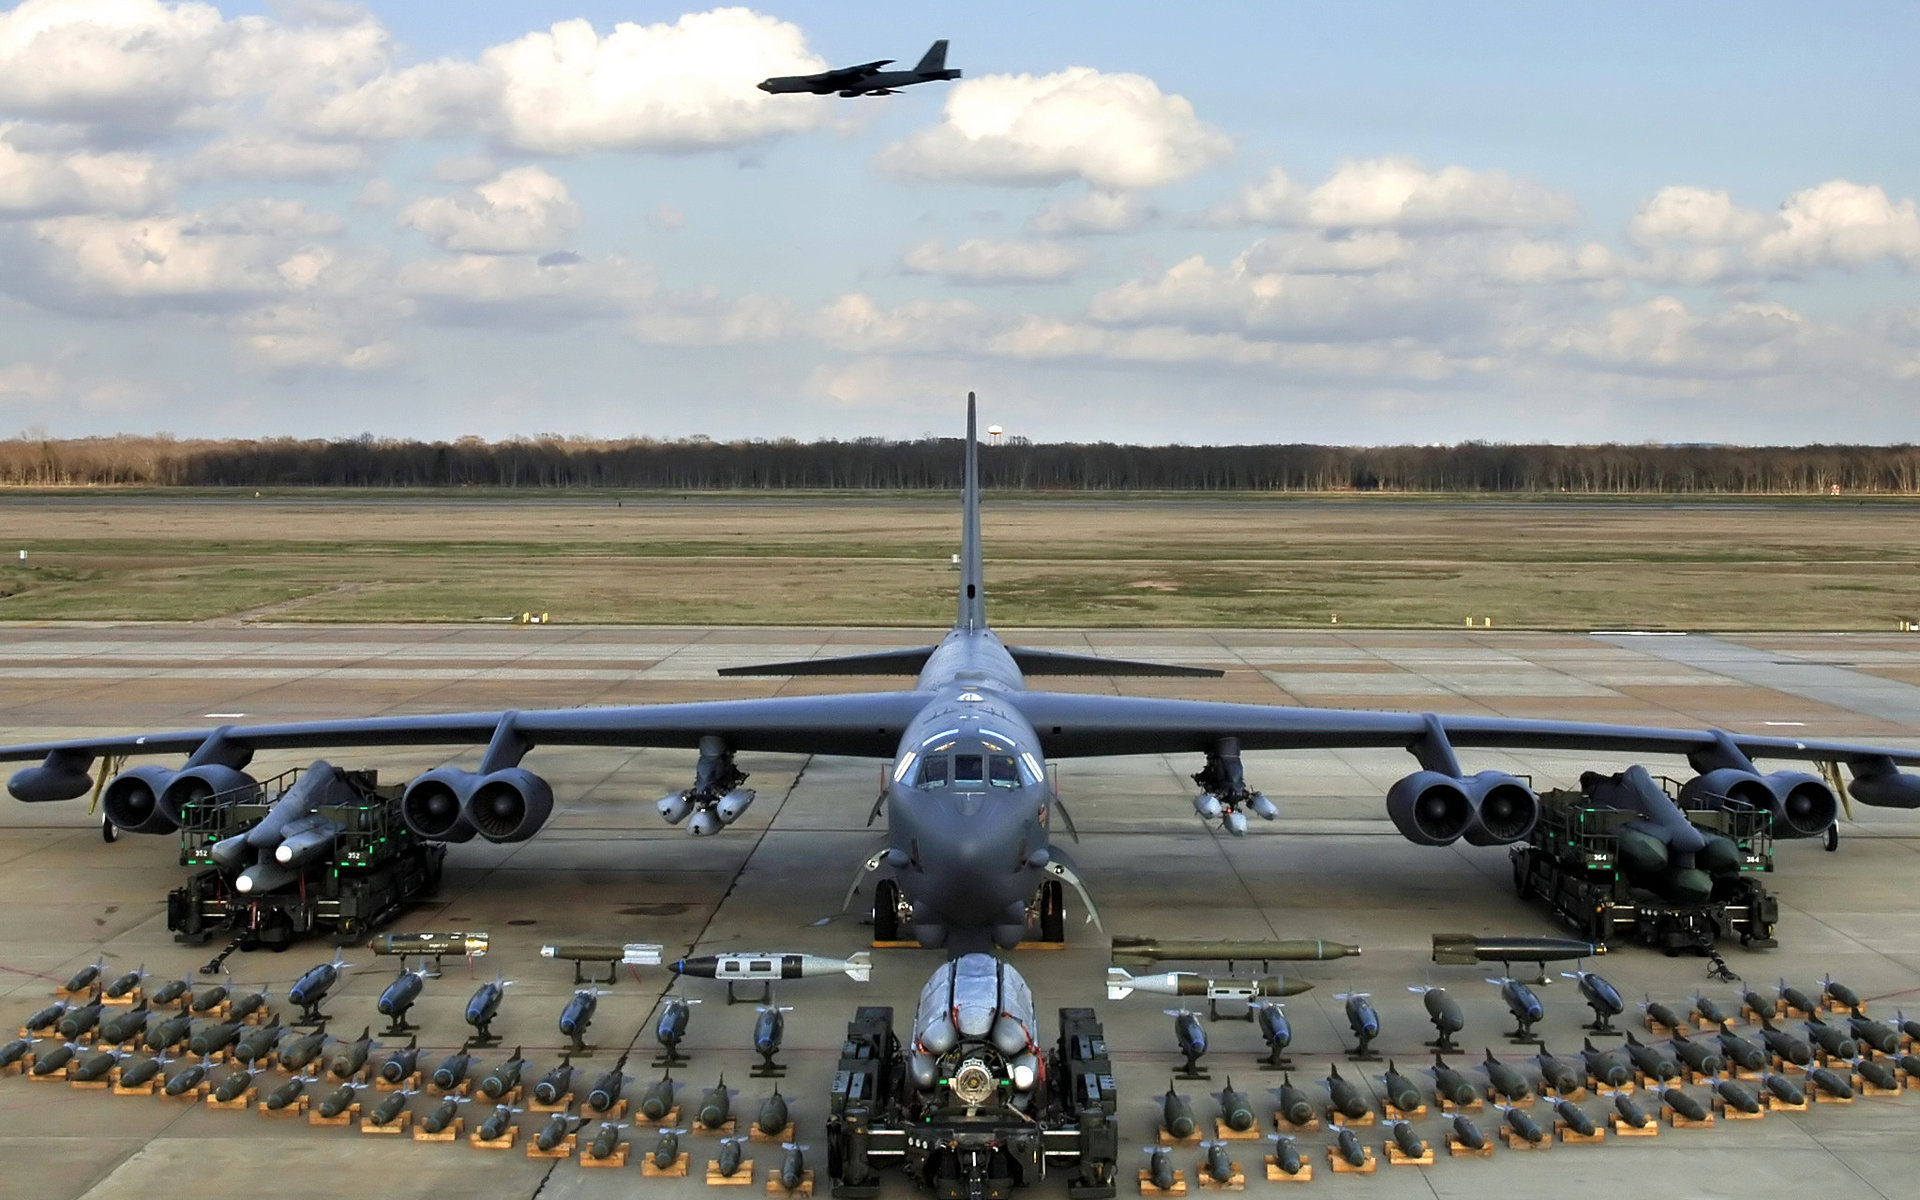 Военная техника обои фото